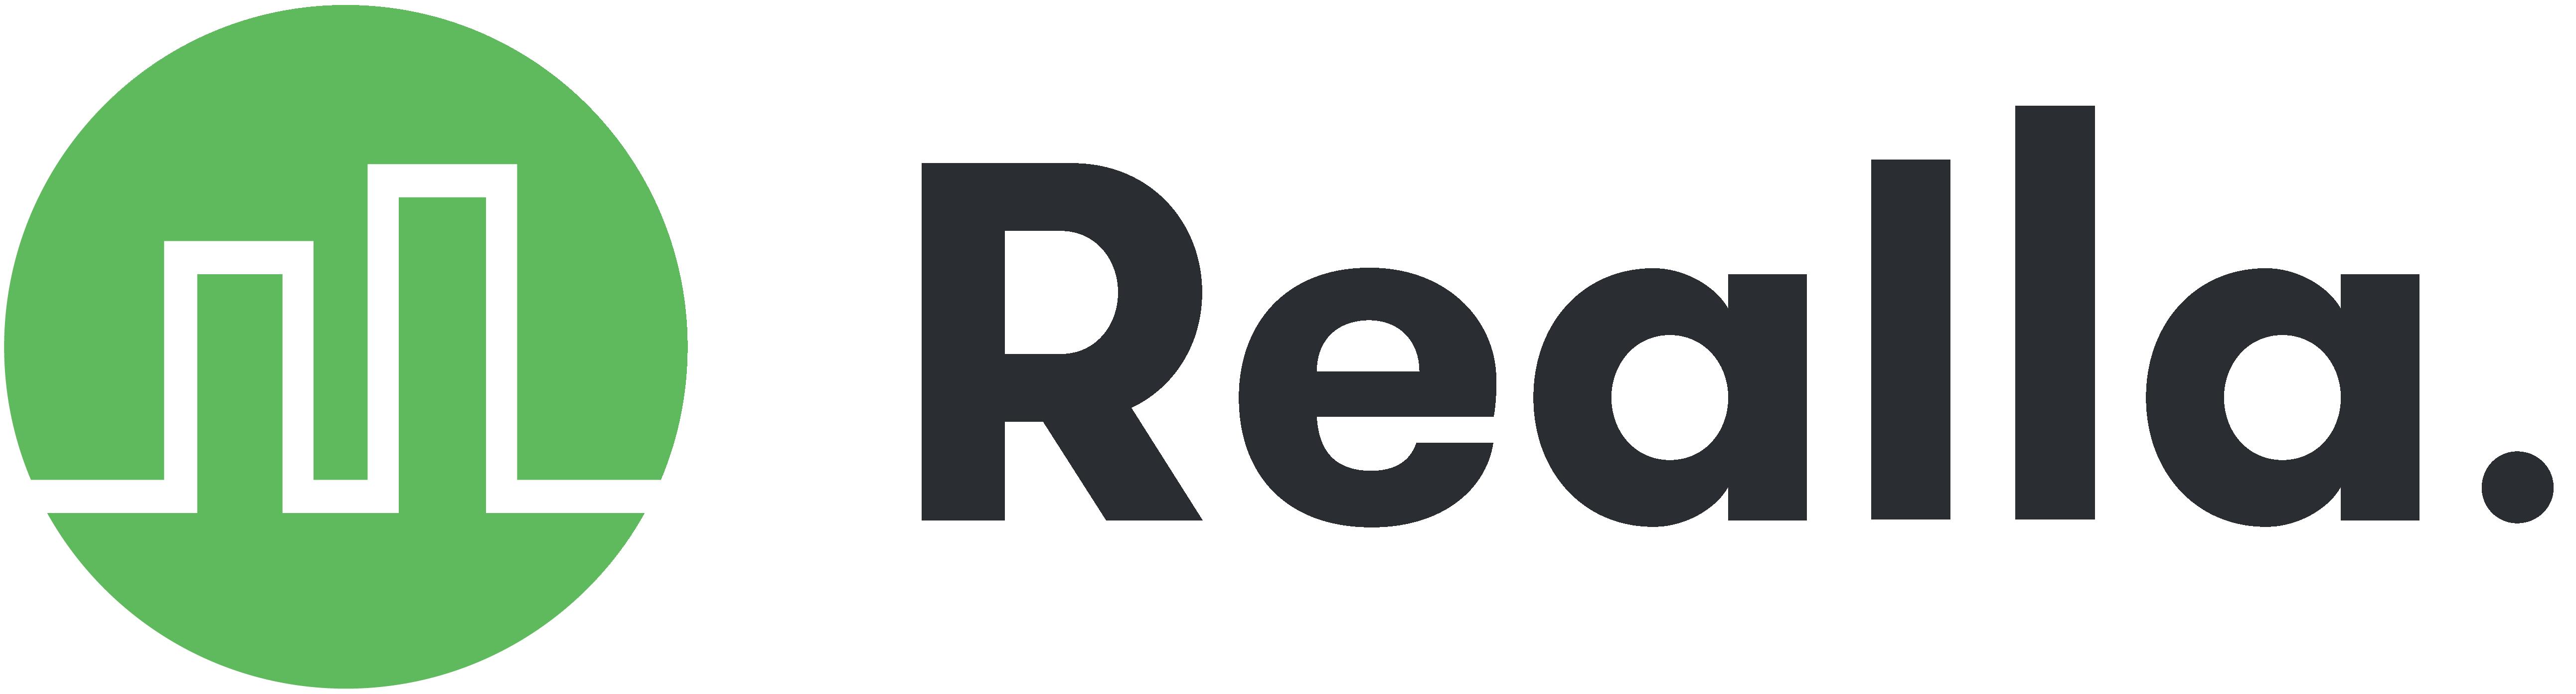 logo_master_RGB_dark_logo-mark-type-7